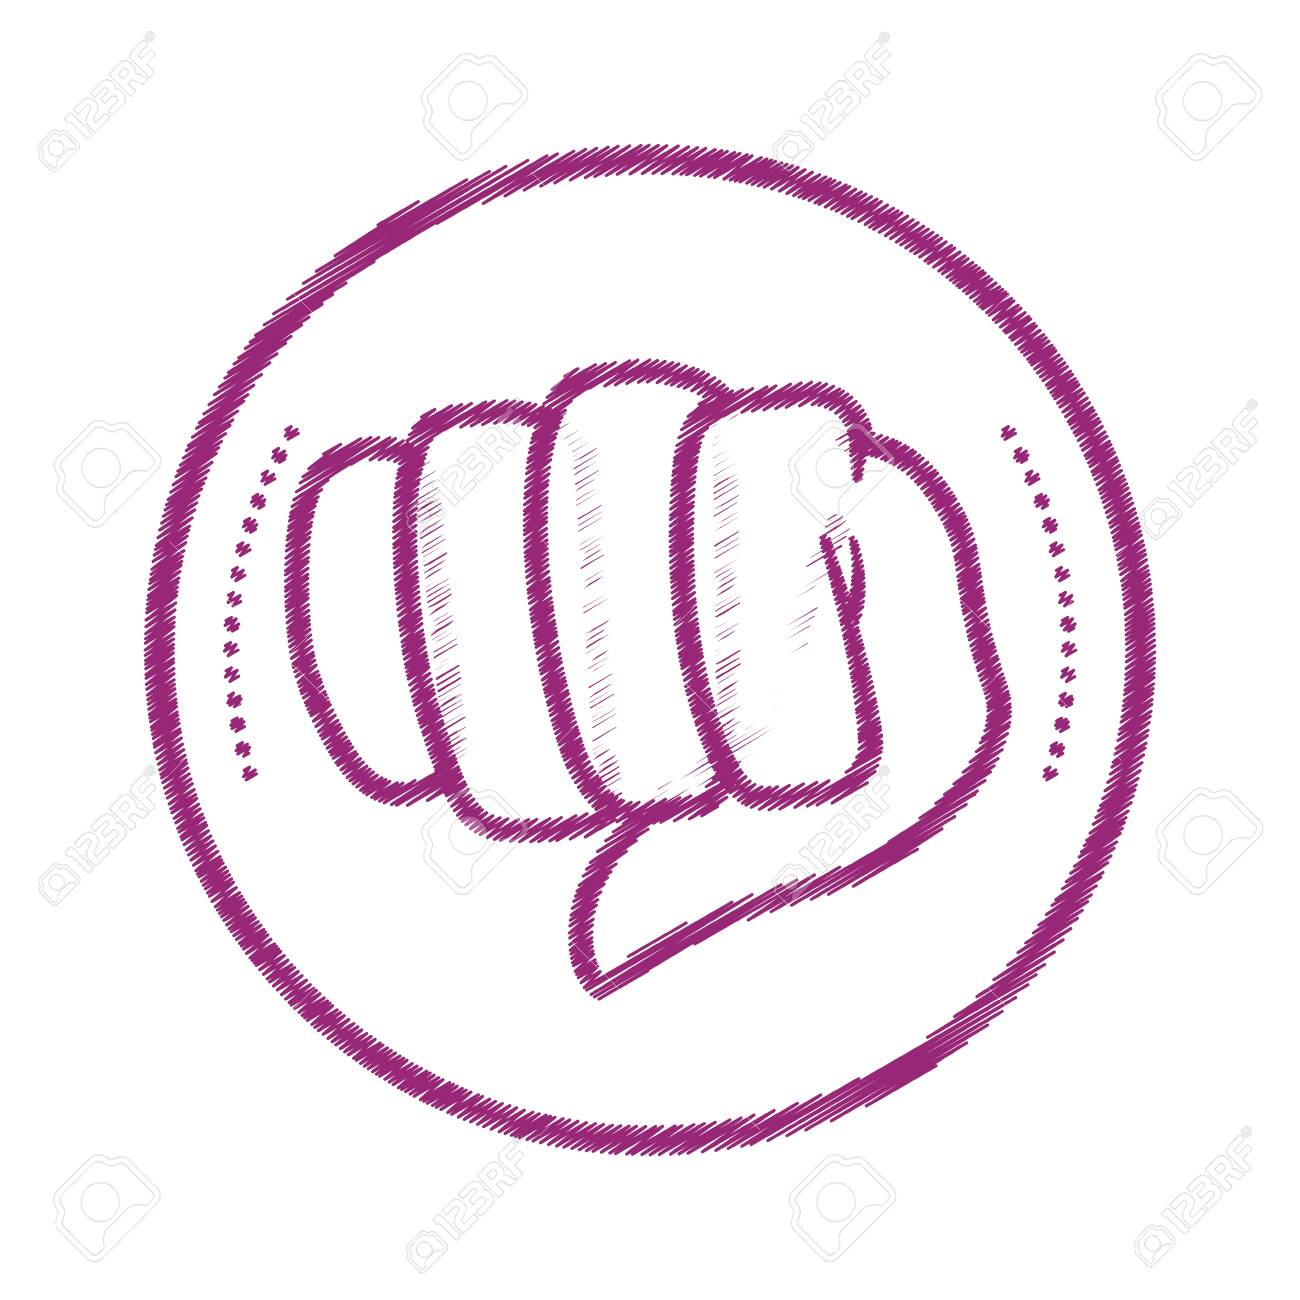 Fist hand symbol icon vector illustration graphic design